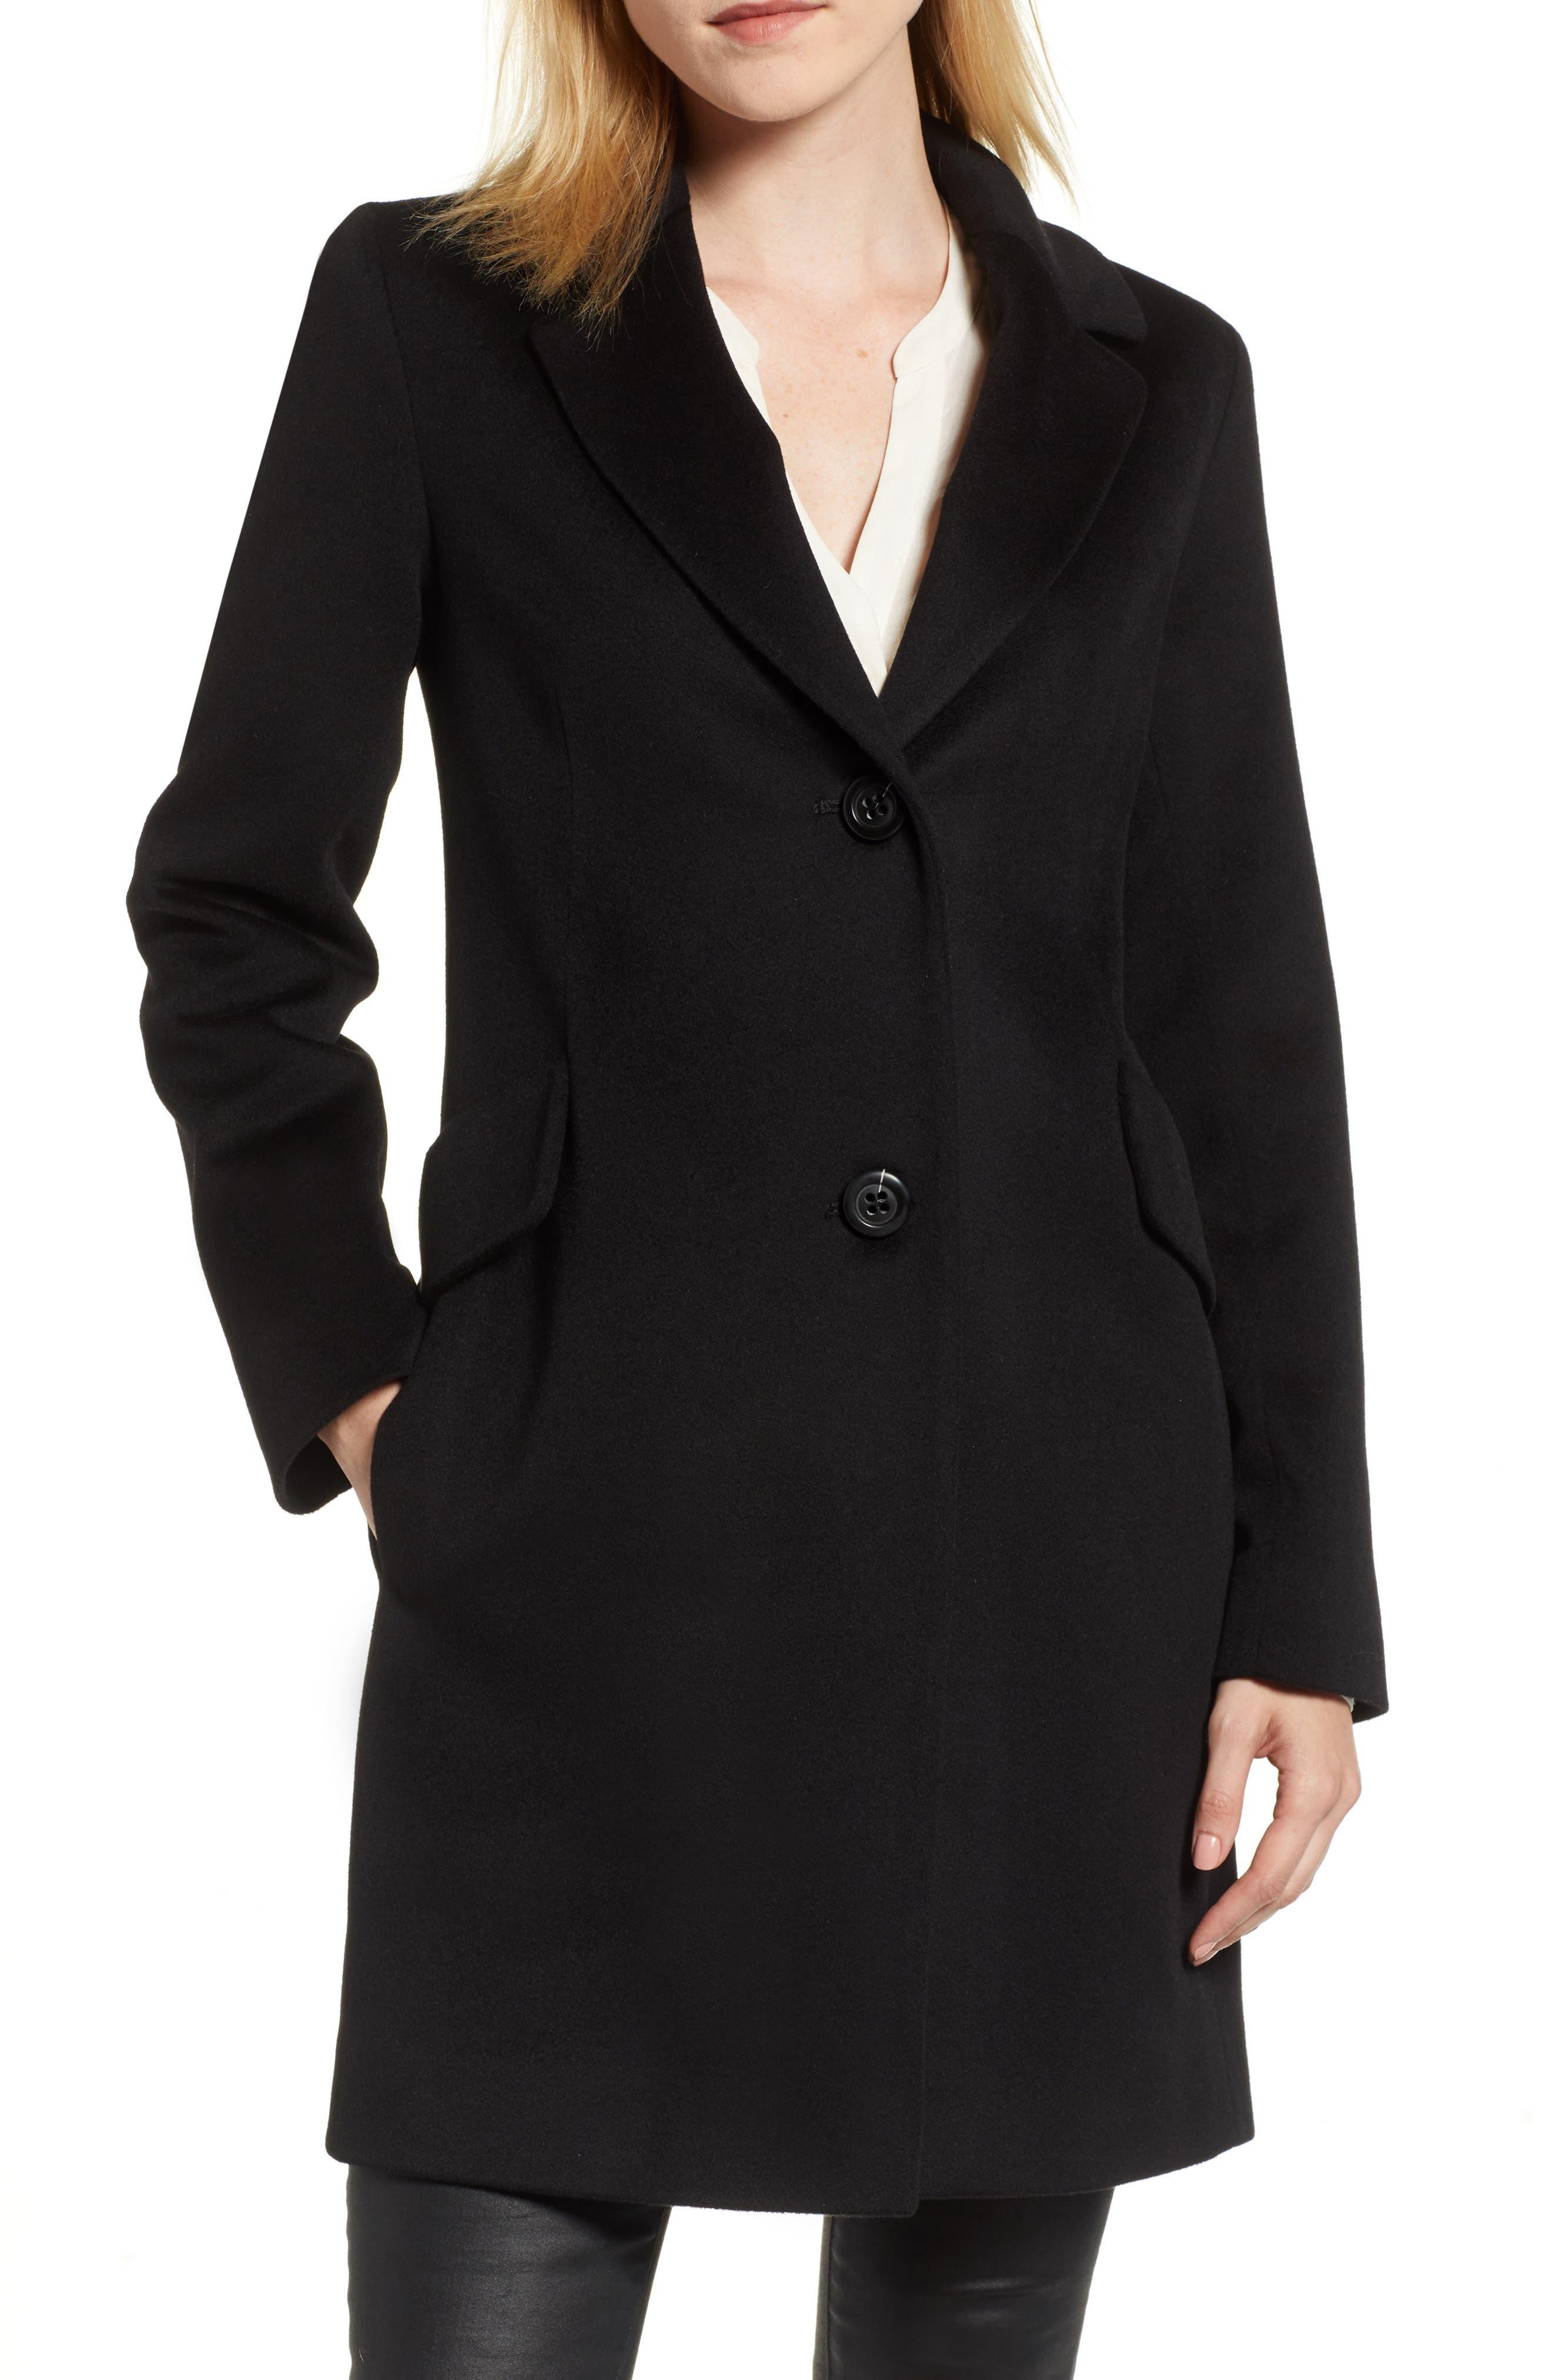 FLEURETTE Notch Collar Wool Coat, Main, color, BLACK